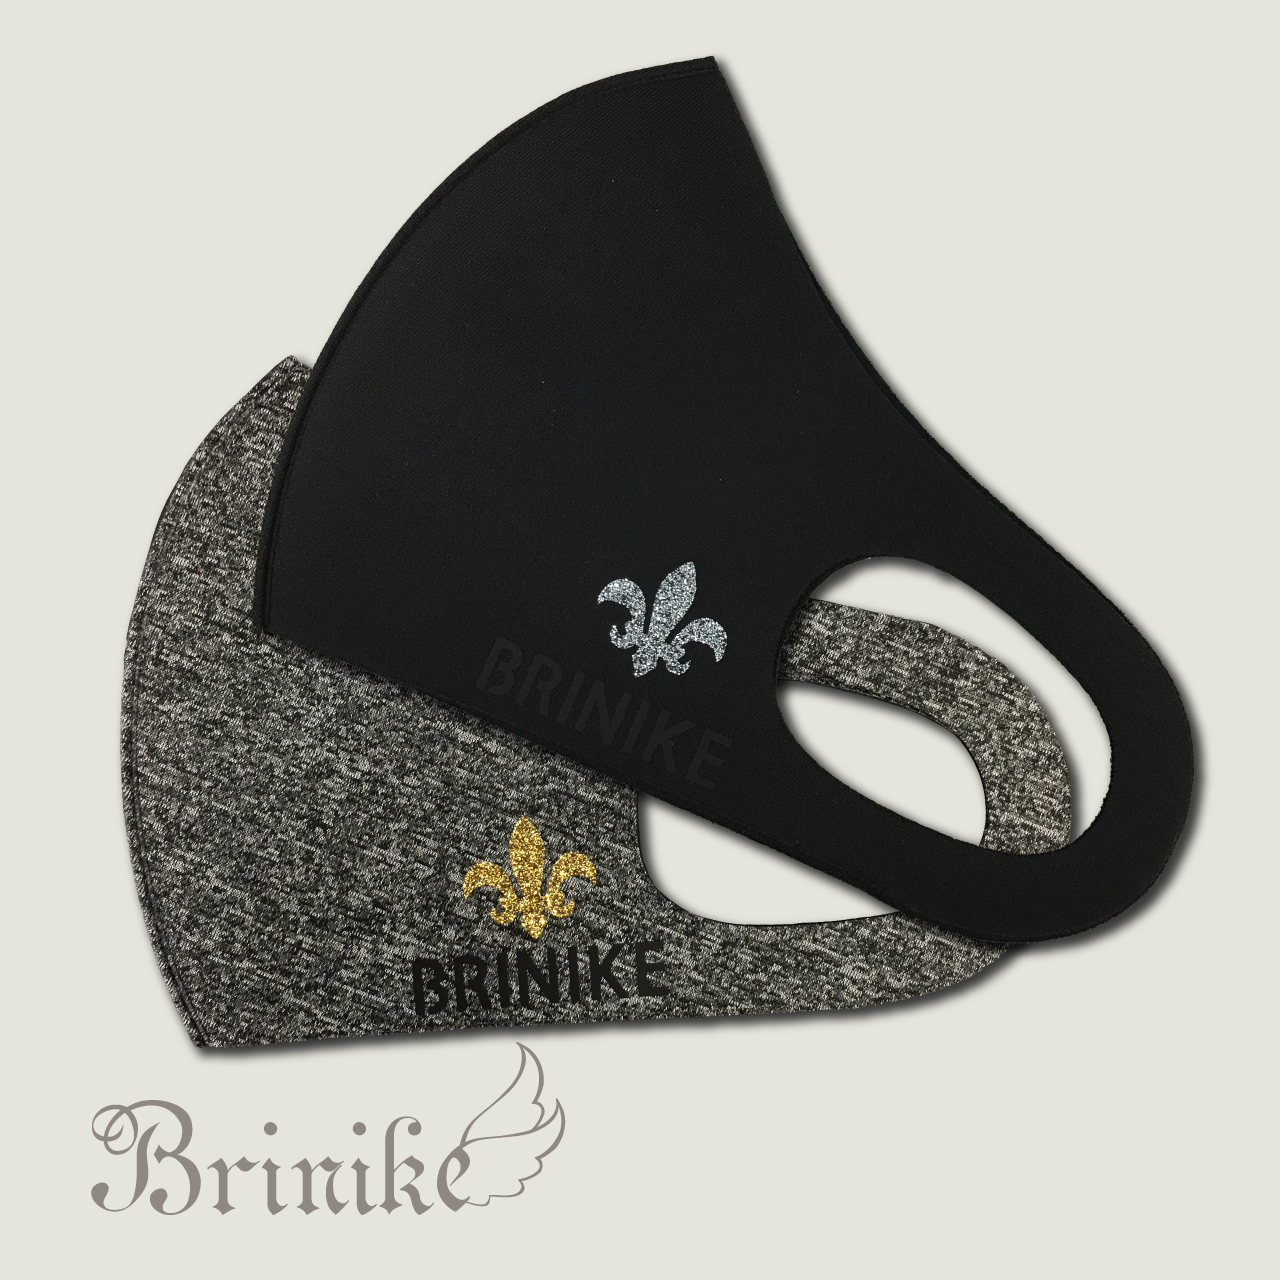 【BRINIKE】デザインマスク◆ユリ